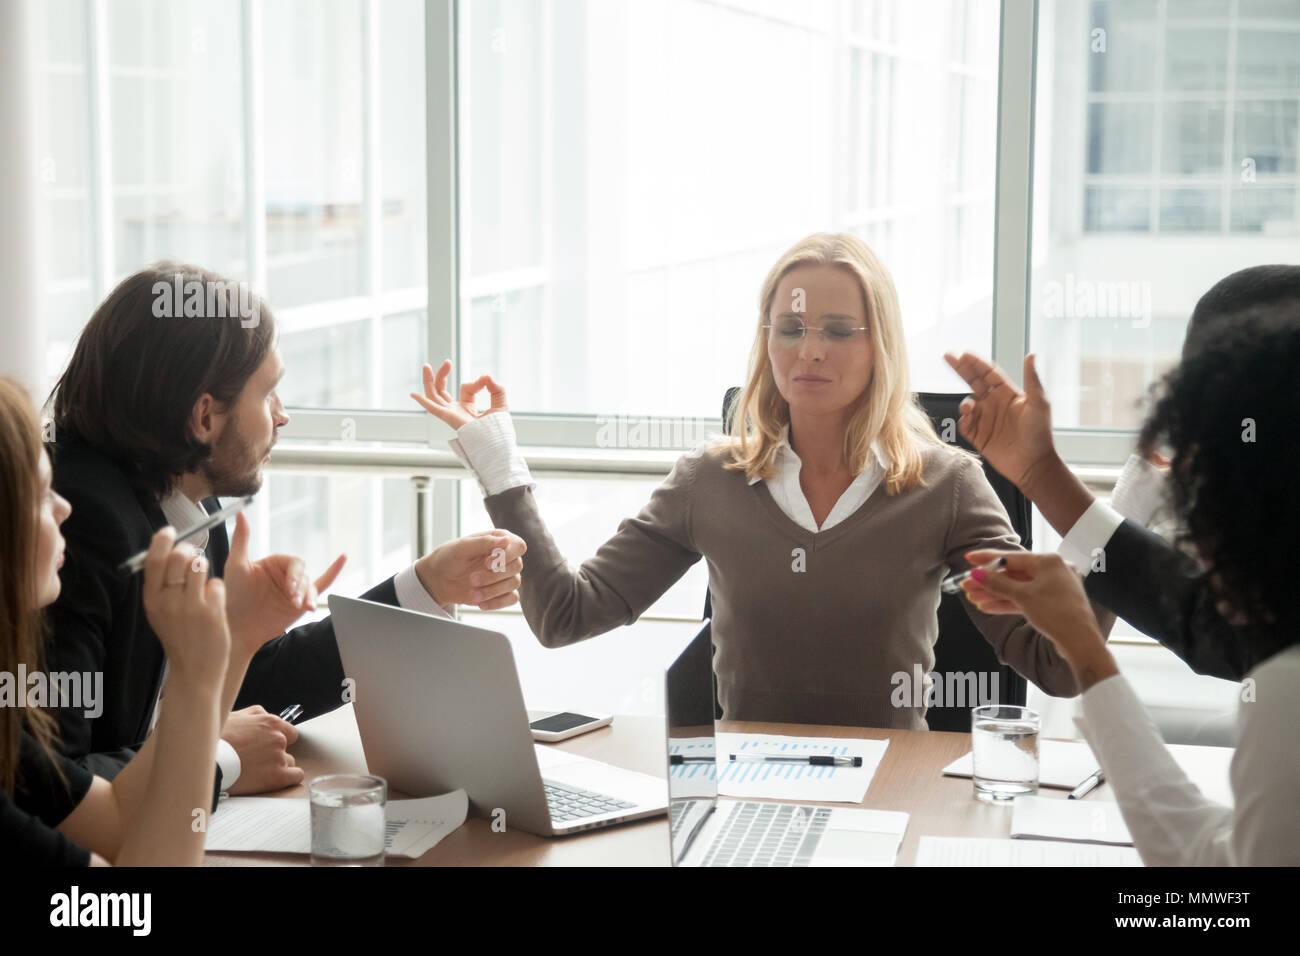 Calm businesswoman boss meditating ignoring multiracial employee - Stock Image